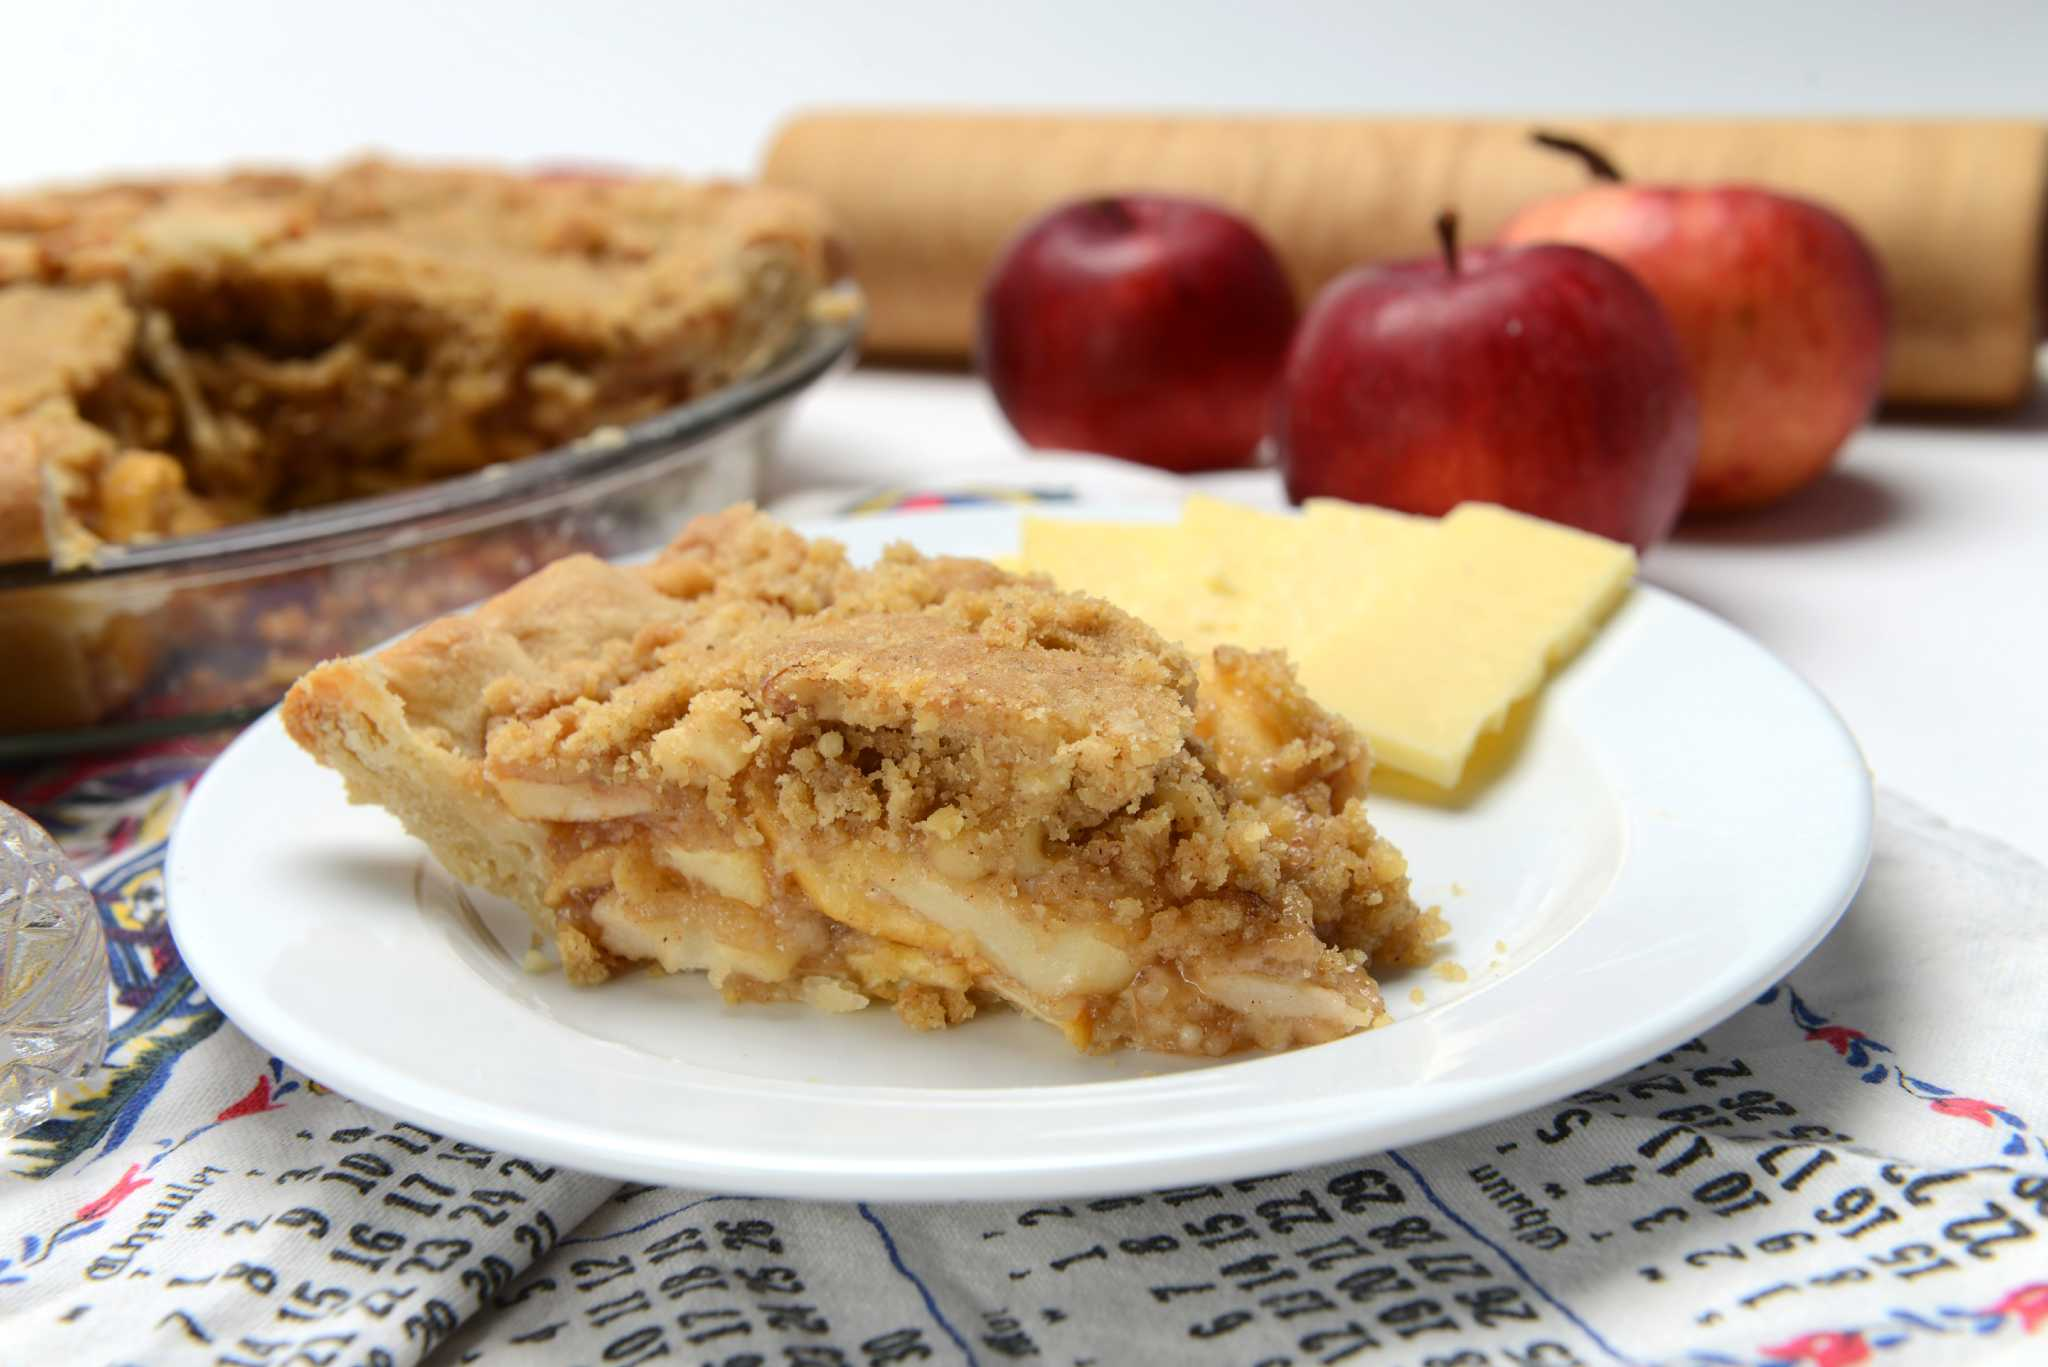 Regardless of true origin, Dutch apple pie a tasty treat